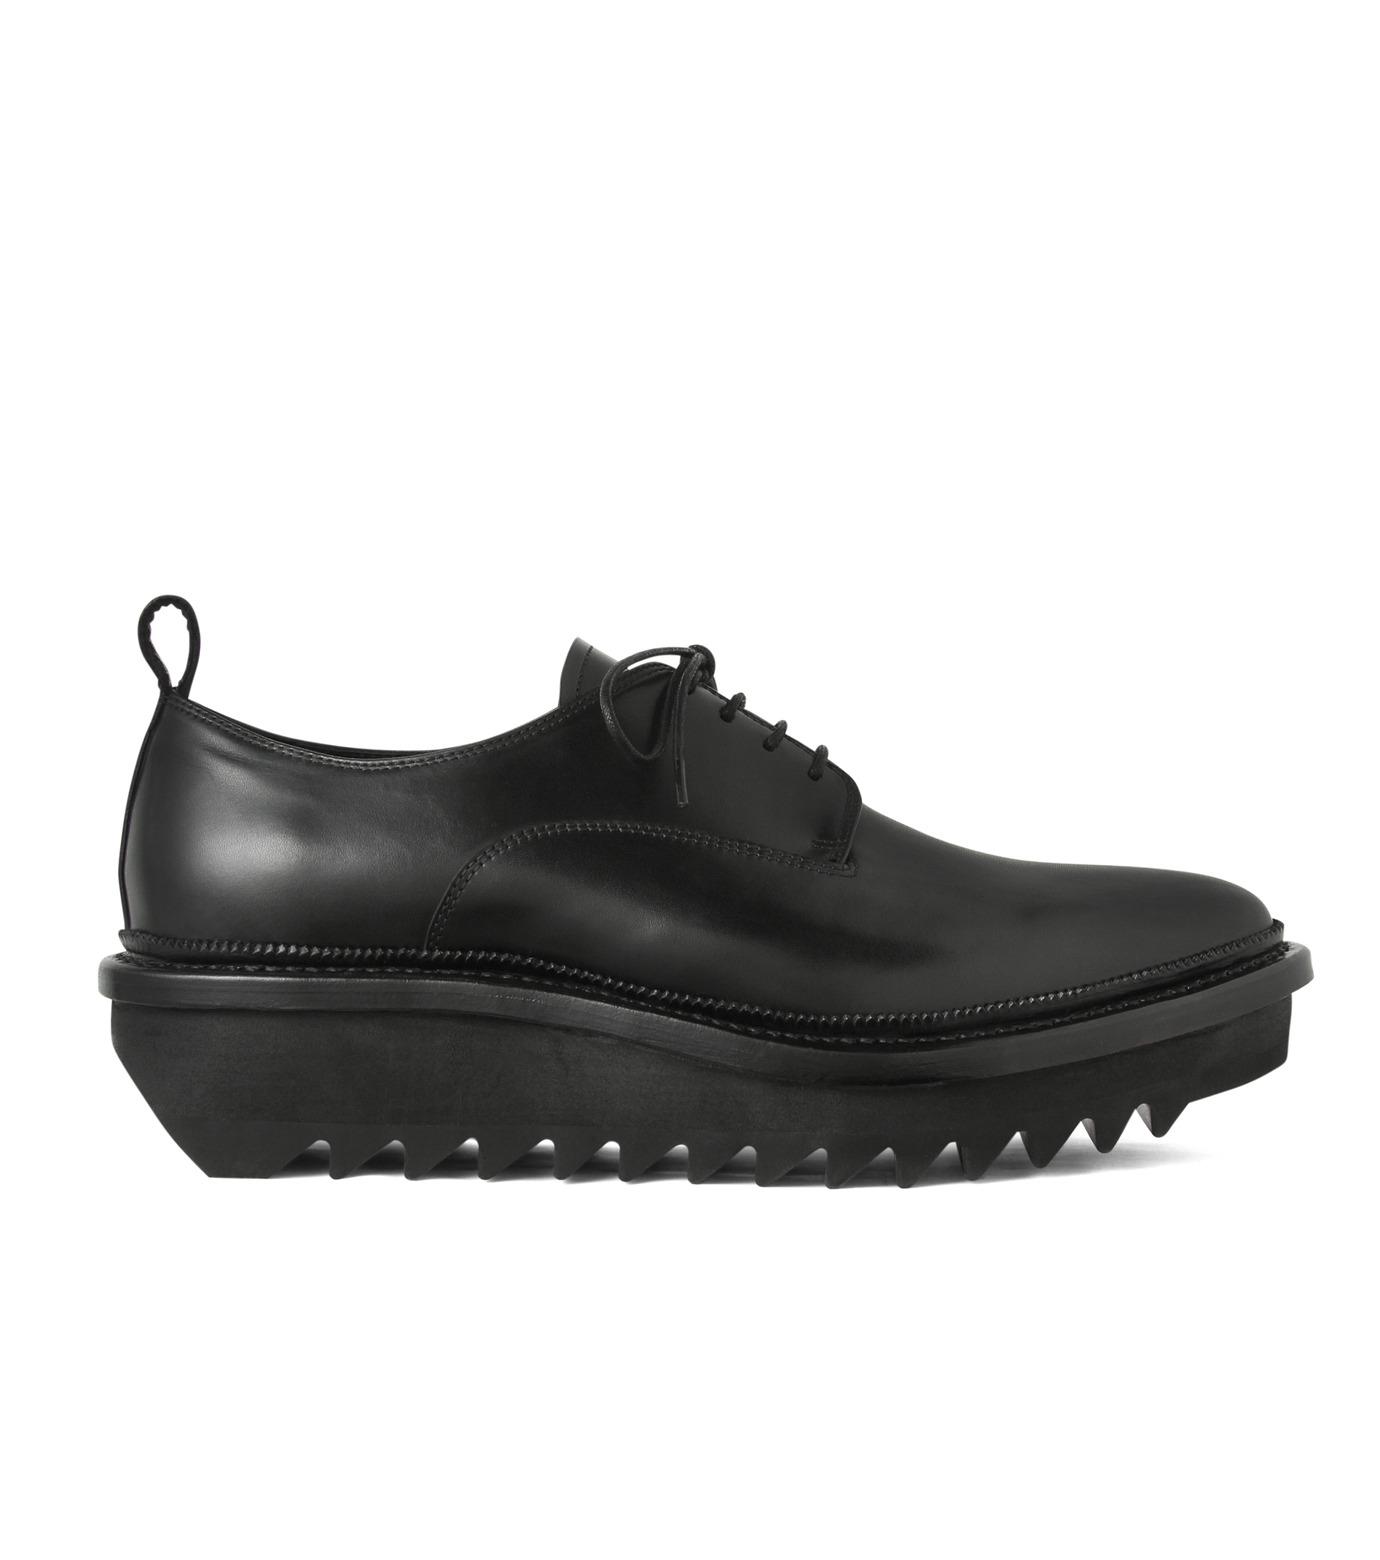 HL HEDDIE LOVU(エイチエル・エディールーヴ)のSHIRKSOLE SHOES-BLACK(シューズ/shoes)-18S90001-13 拡大詳細画像1